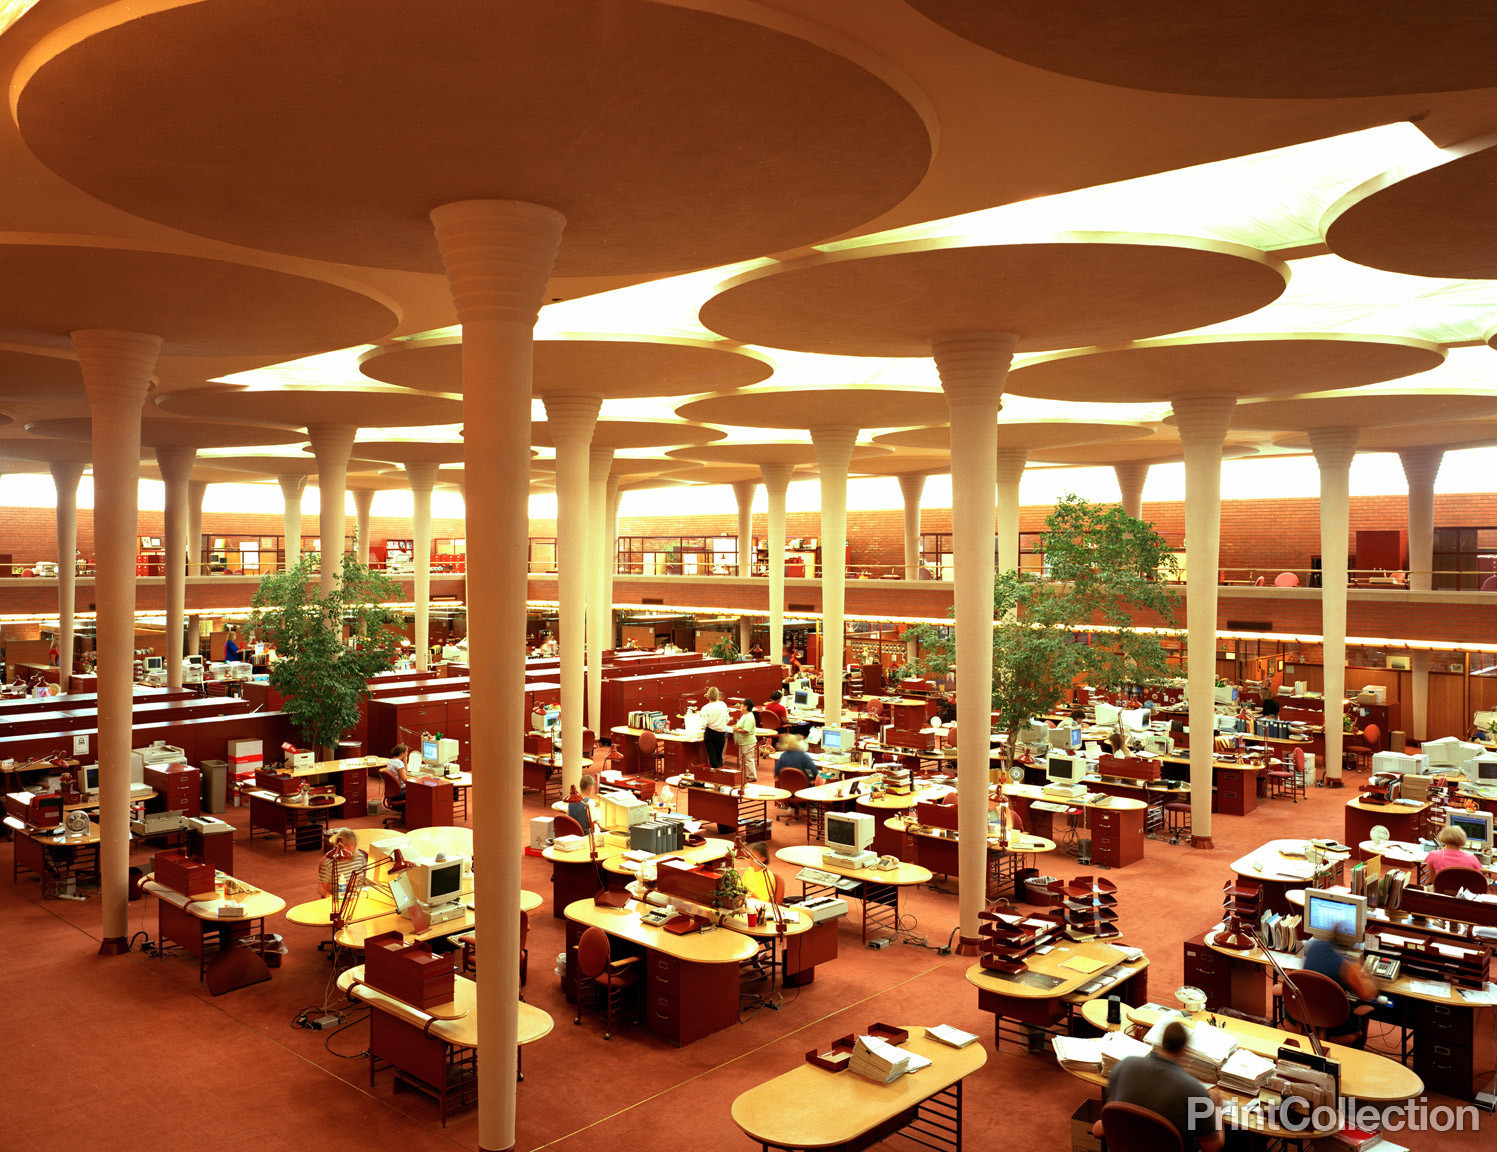 Johnson wax headquarters id 161 - Johnson and johnson office locations ...